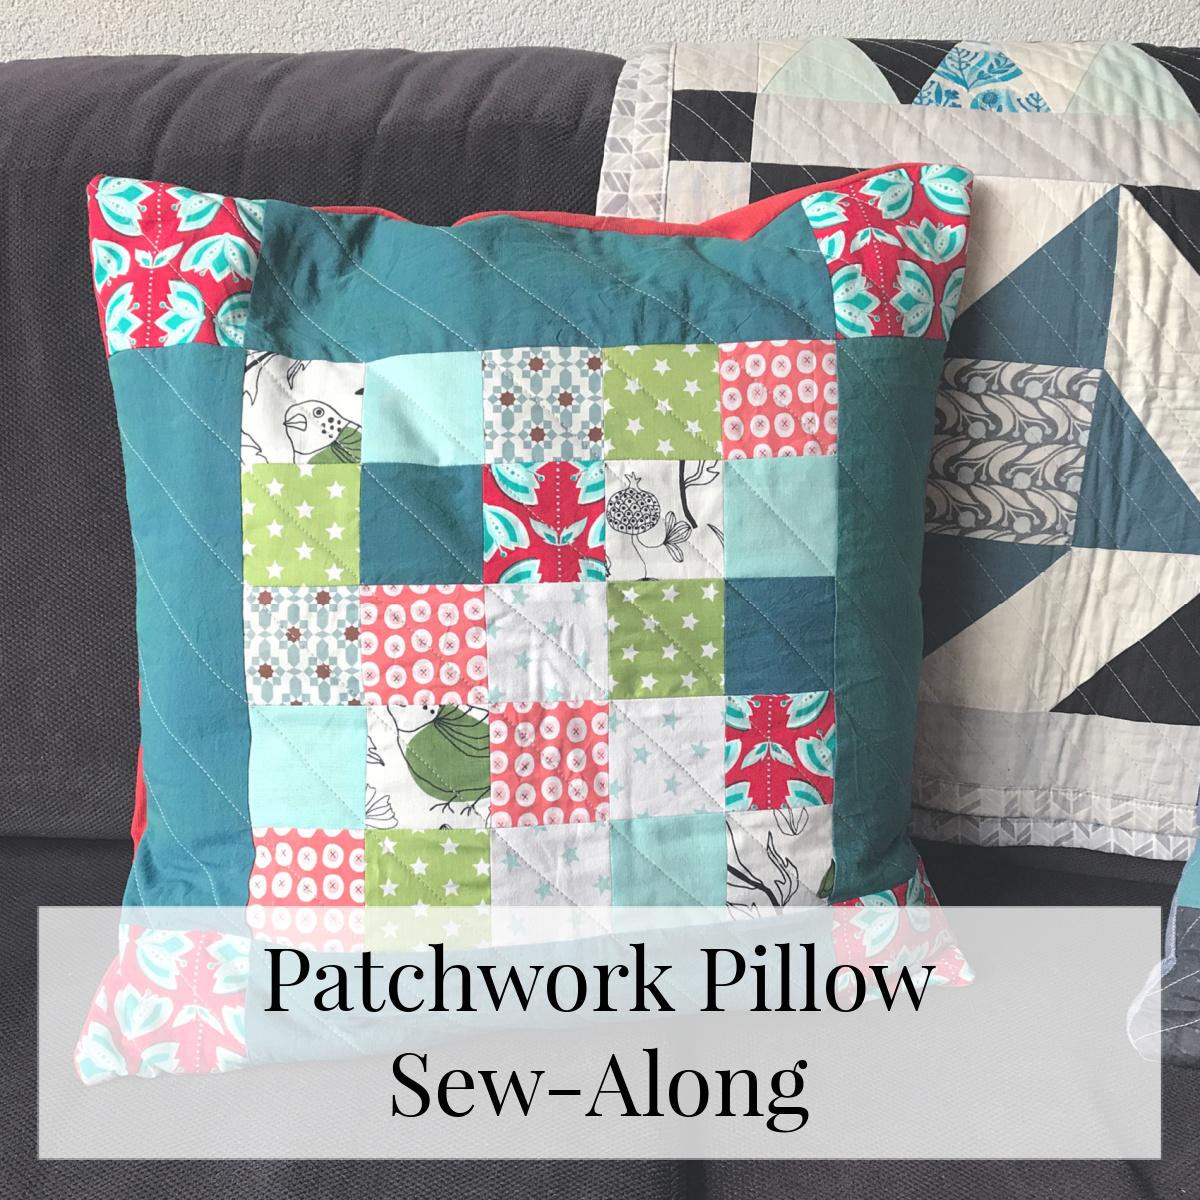 patchwork pillow sew-along titel